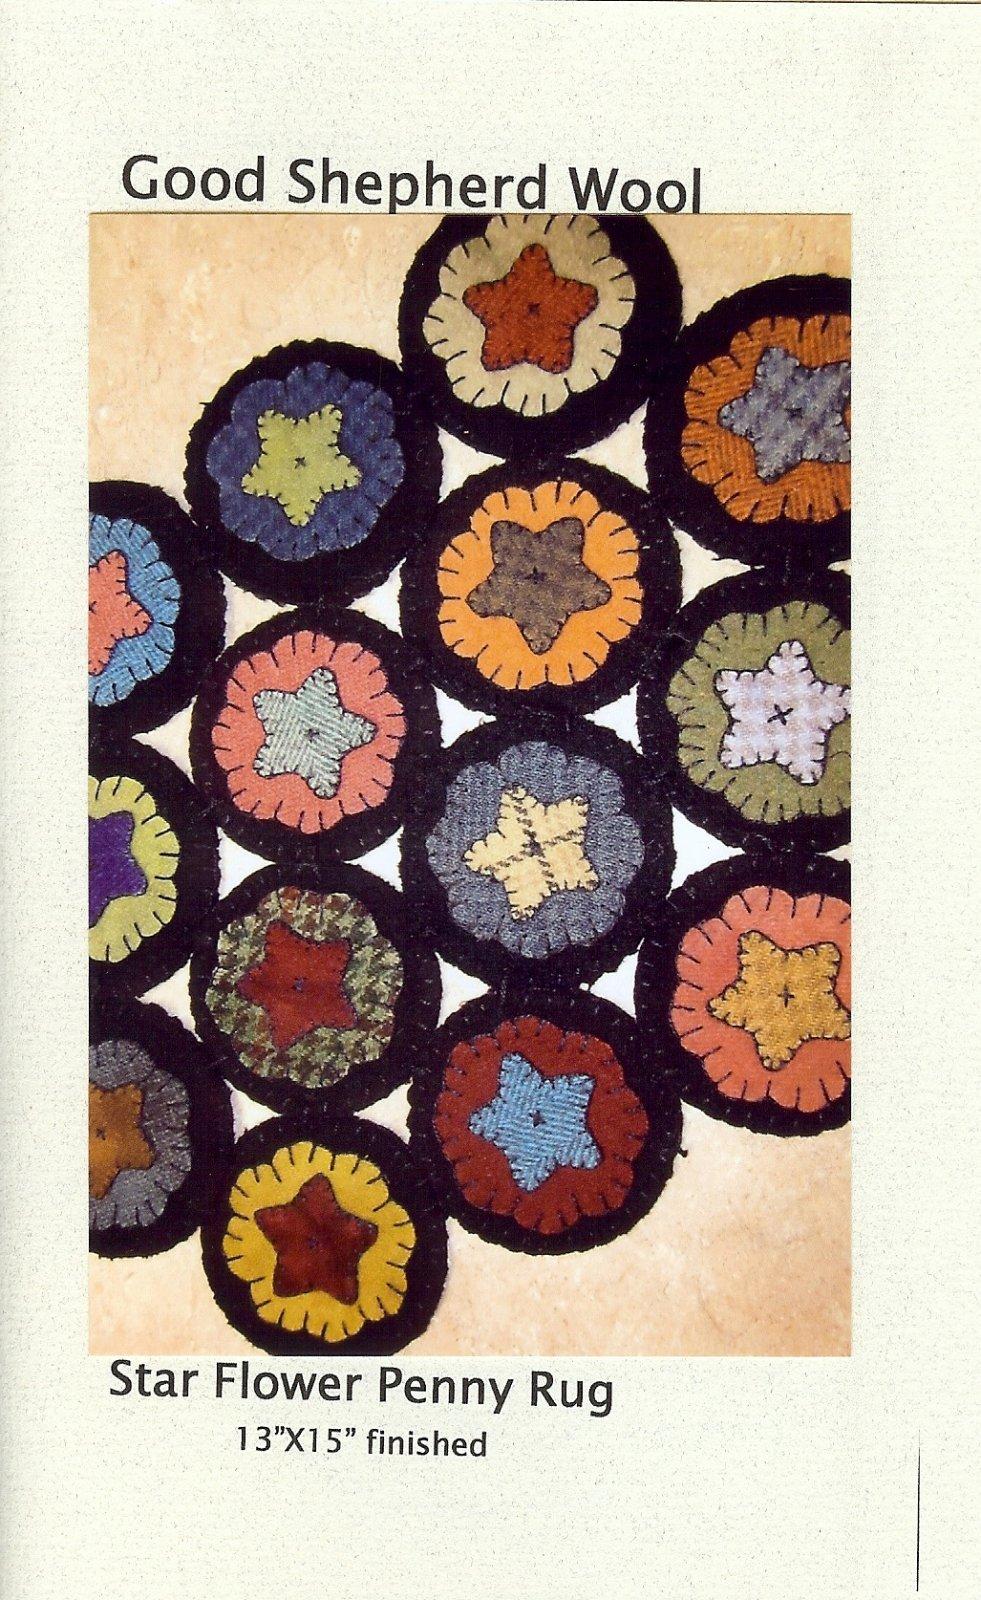 Star Flower Penny Rug